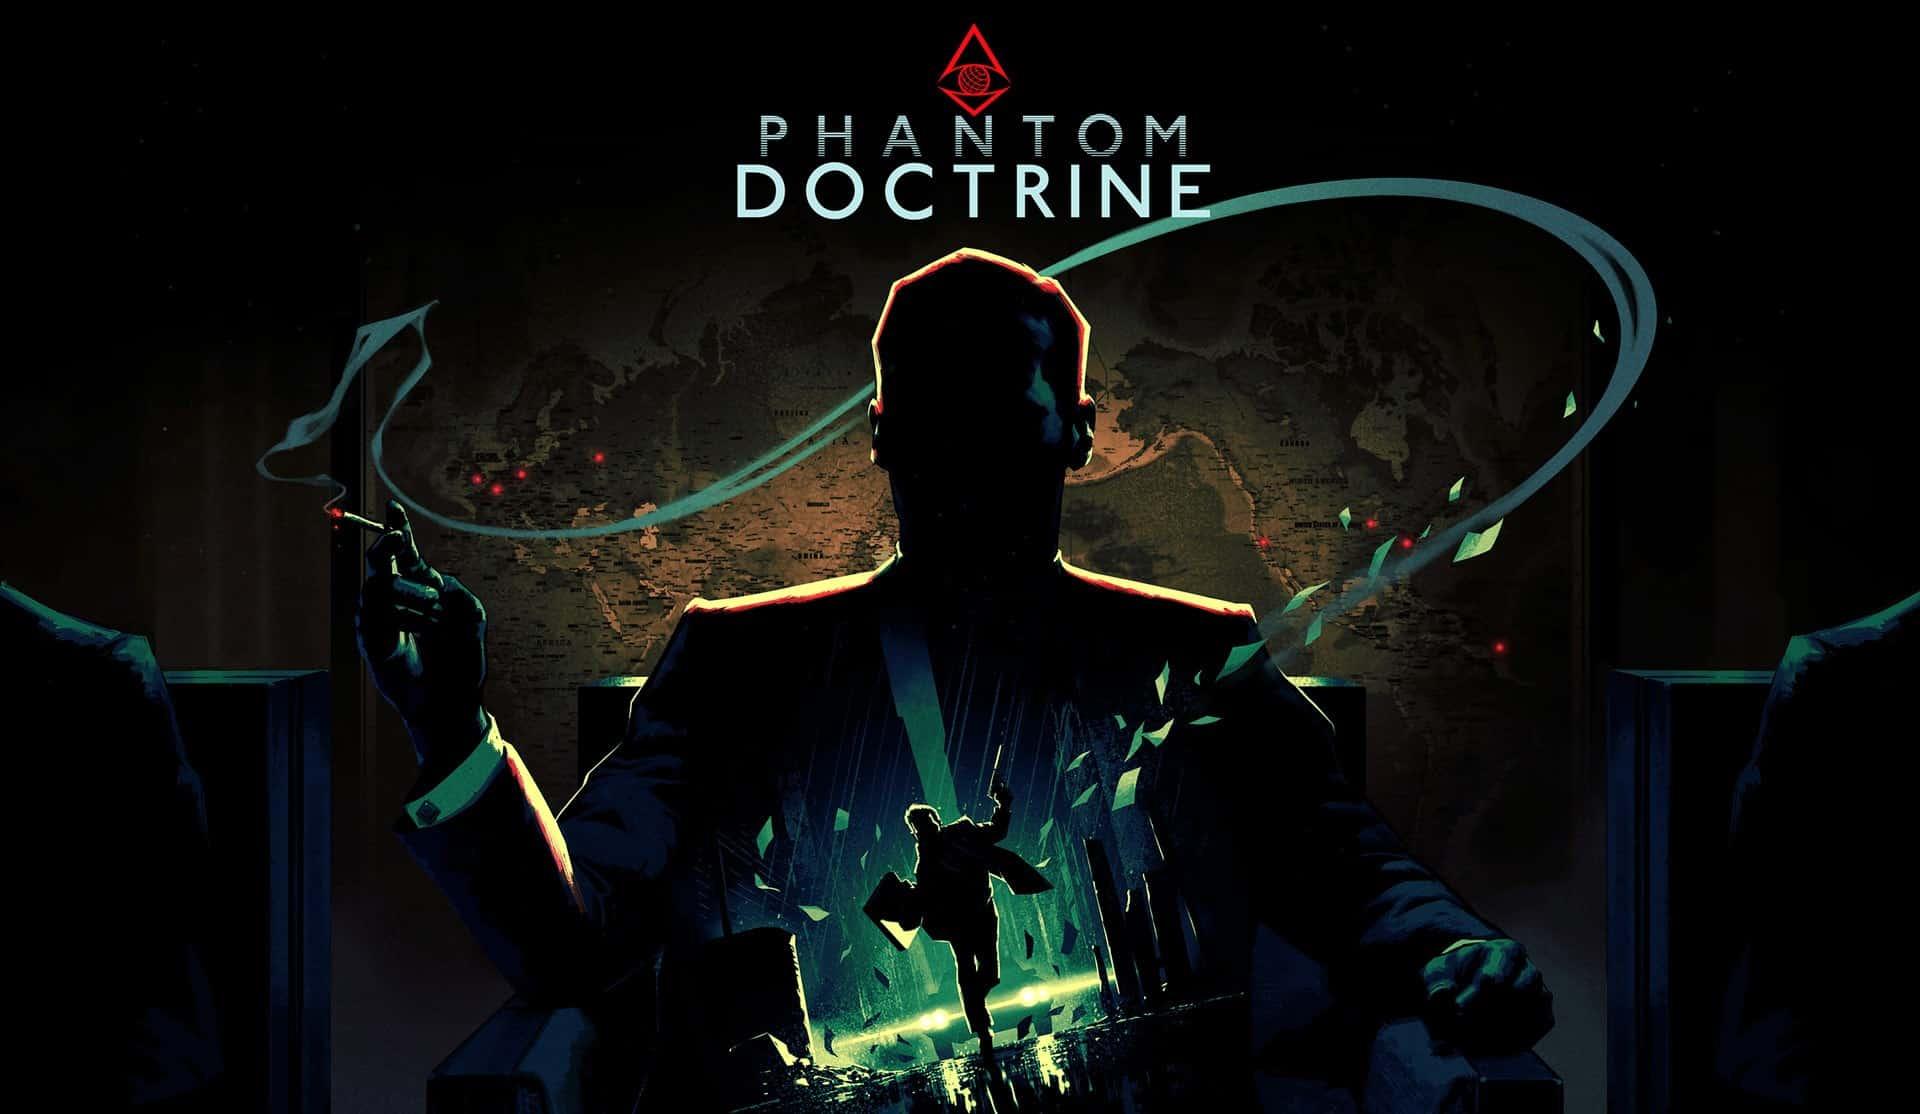 Phantom Doctrine herunterladen frei PC